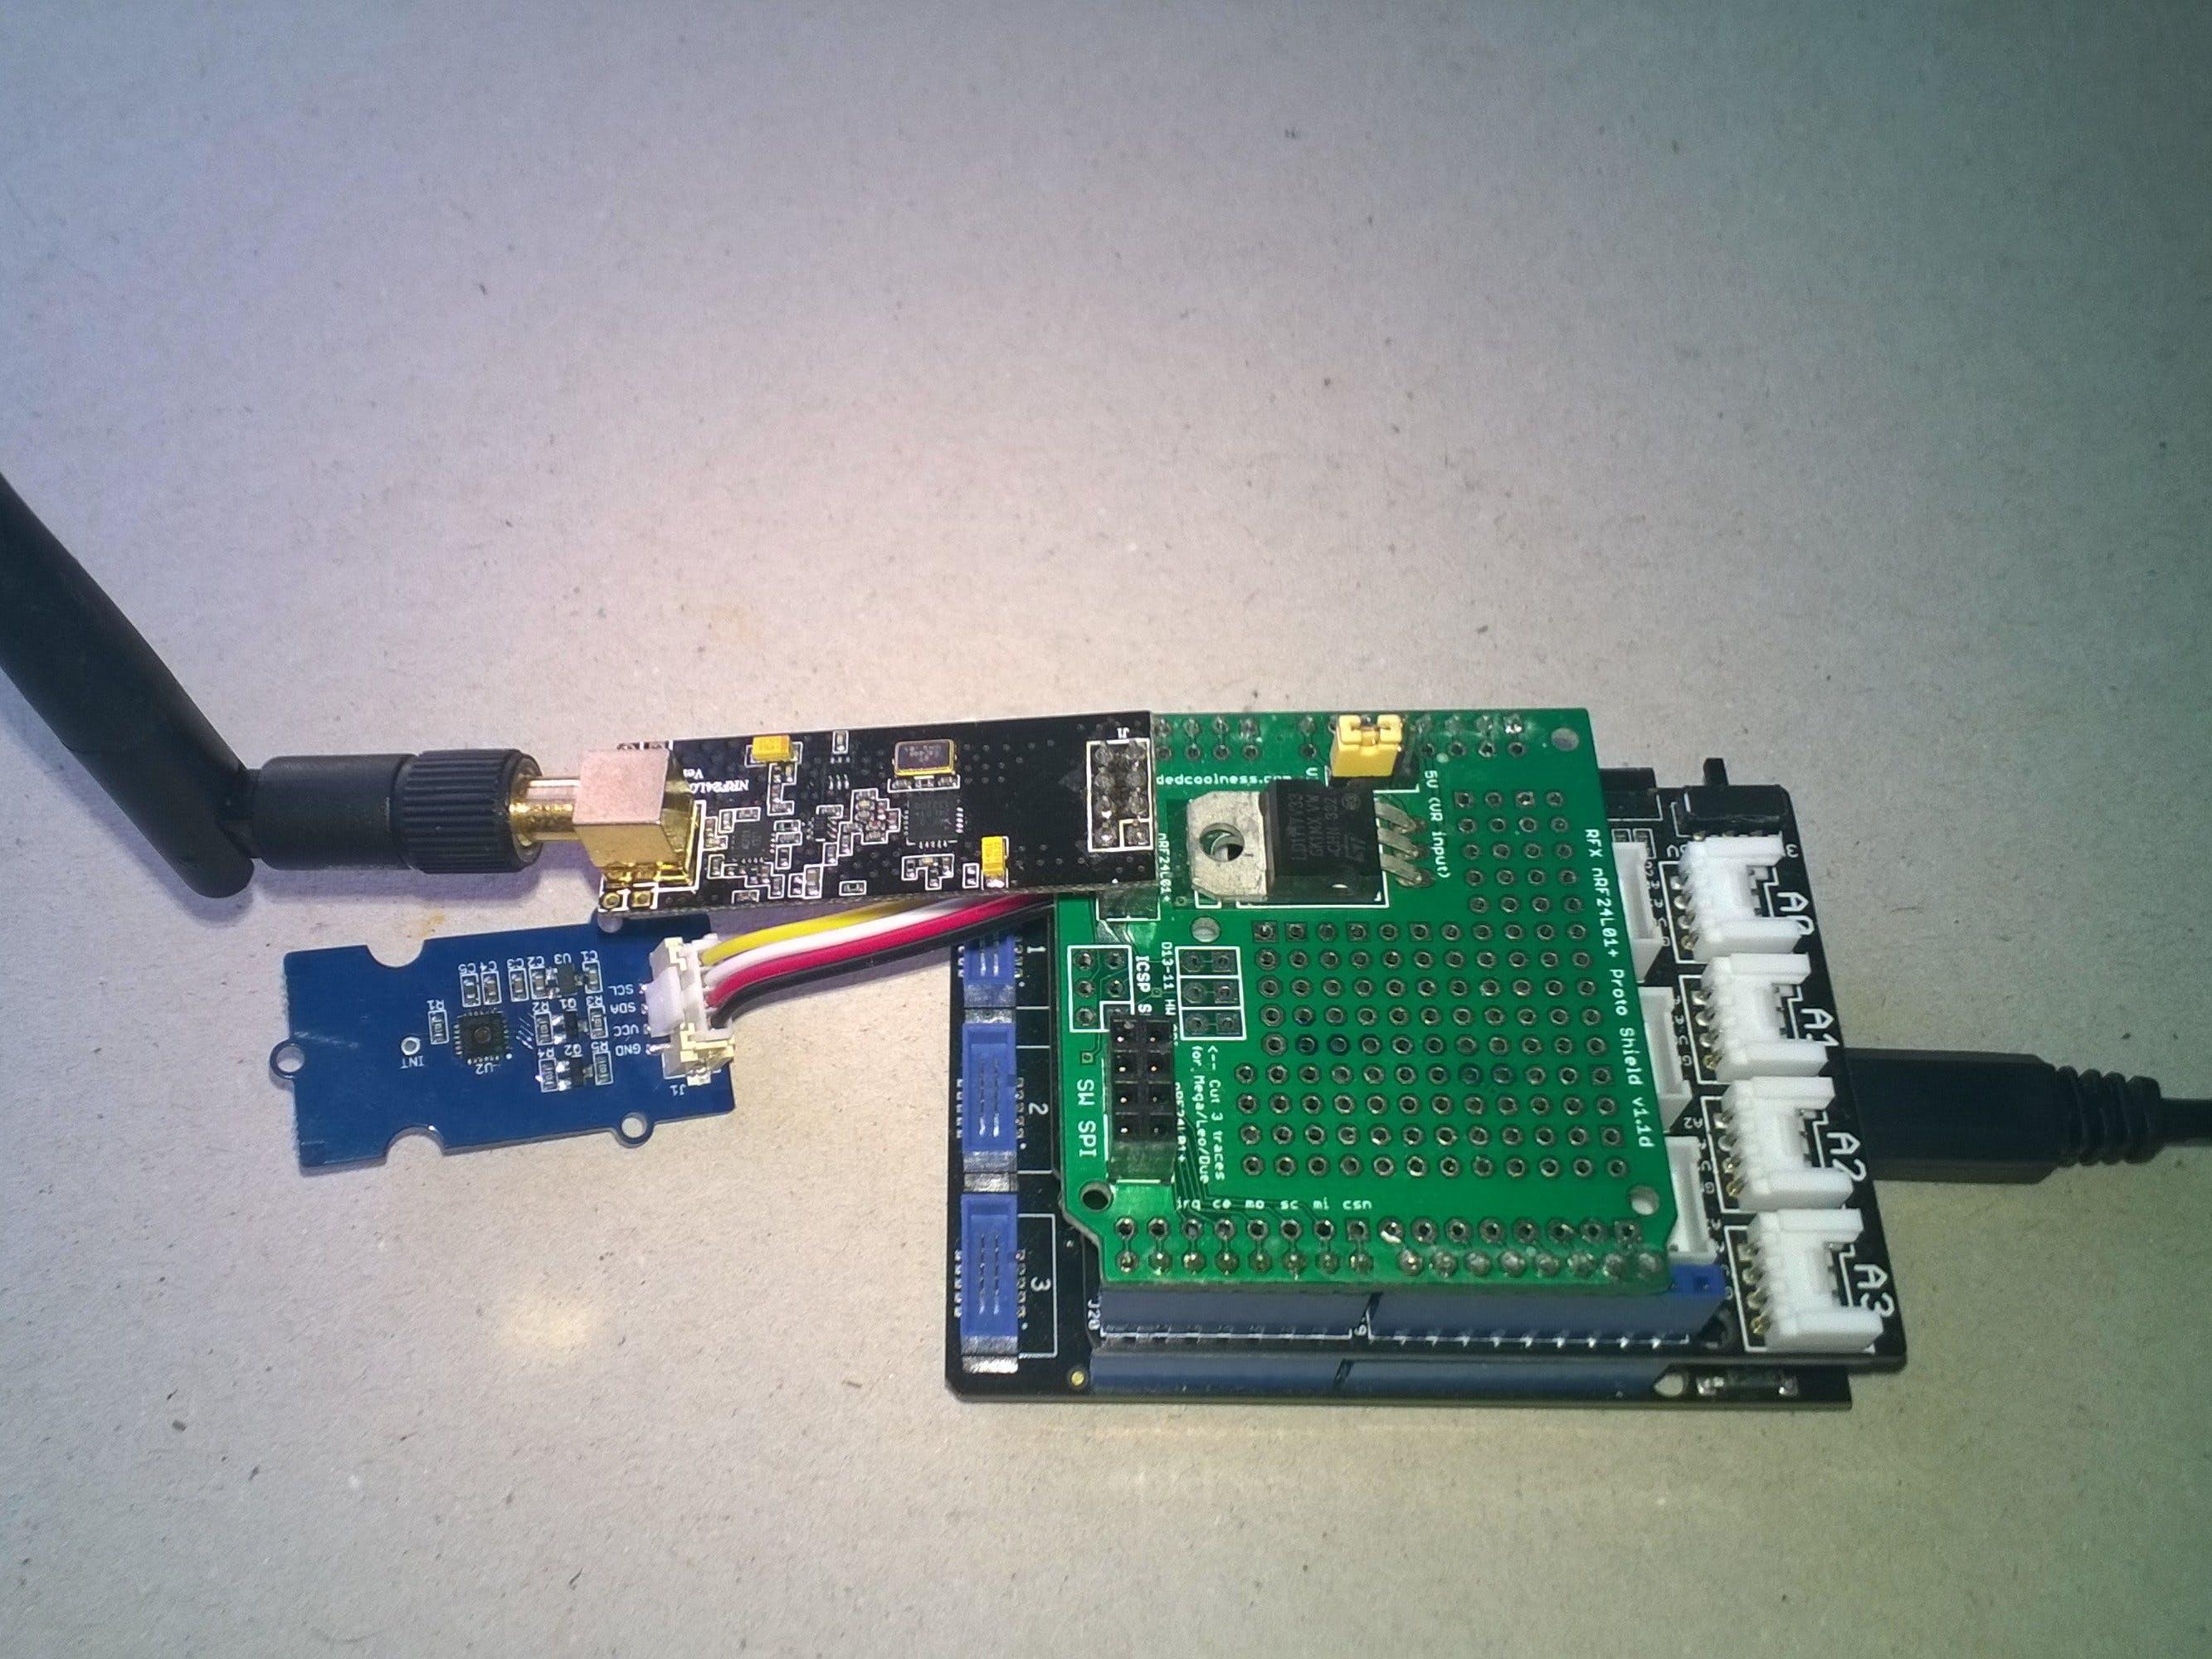 nRF24L01 Windows 10 IoT Core Field Gateway Netduino client